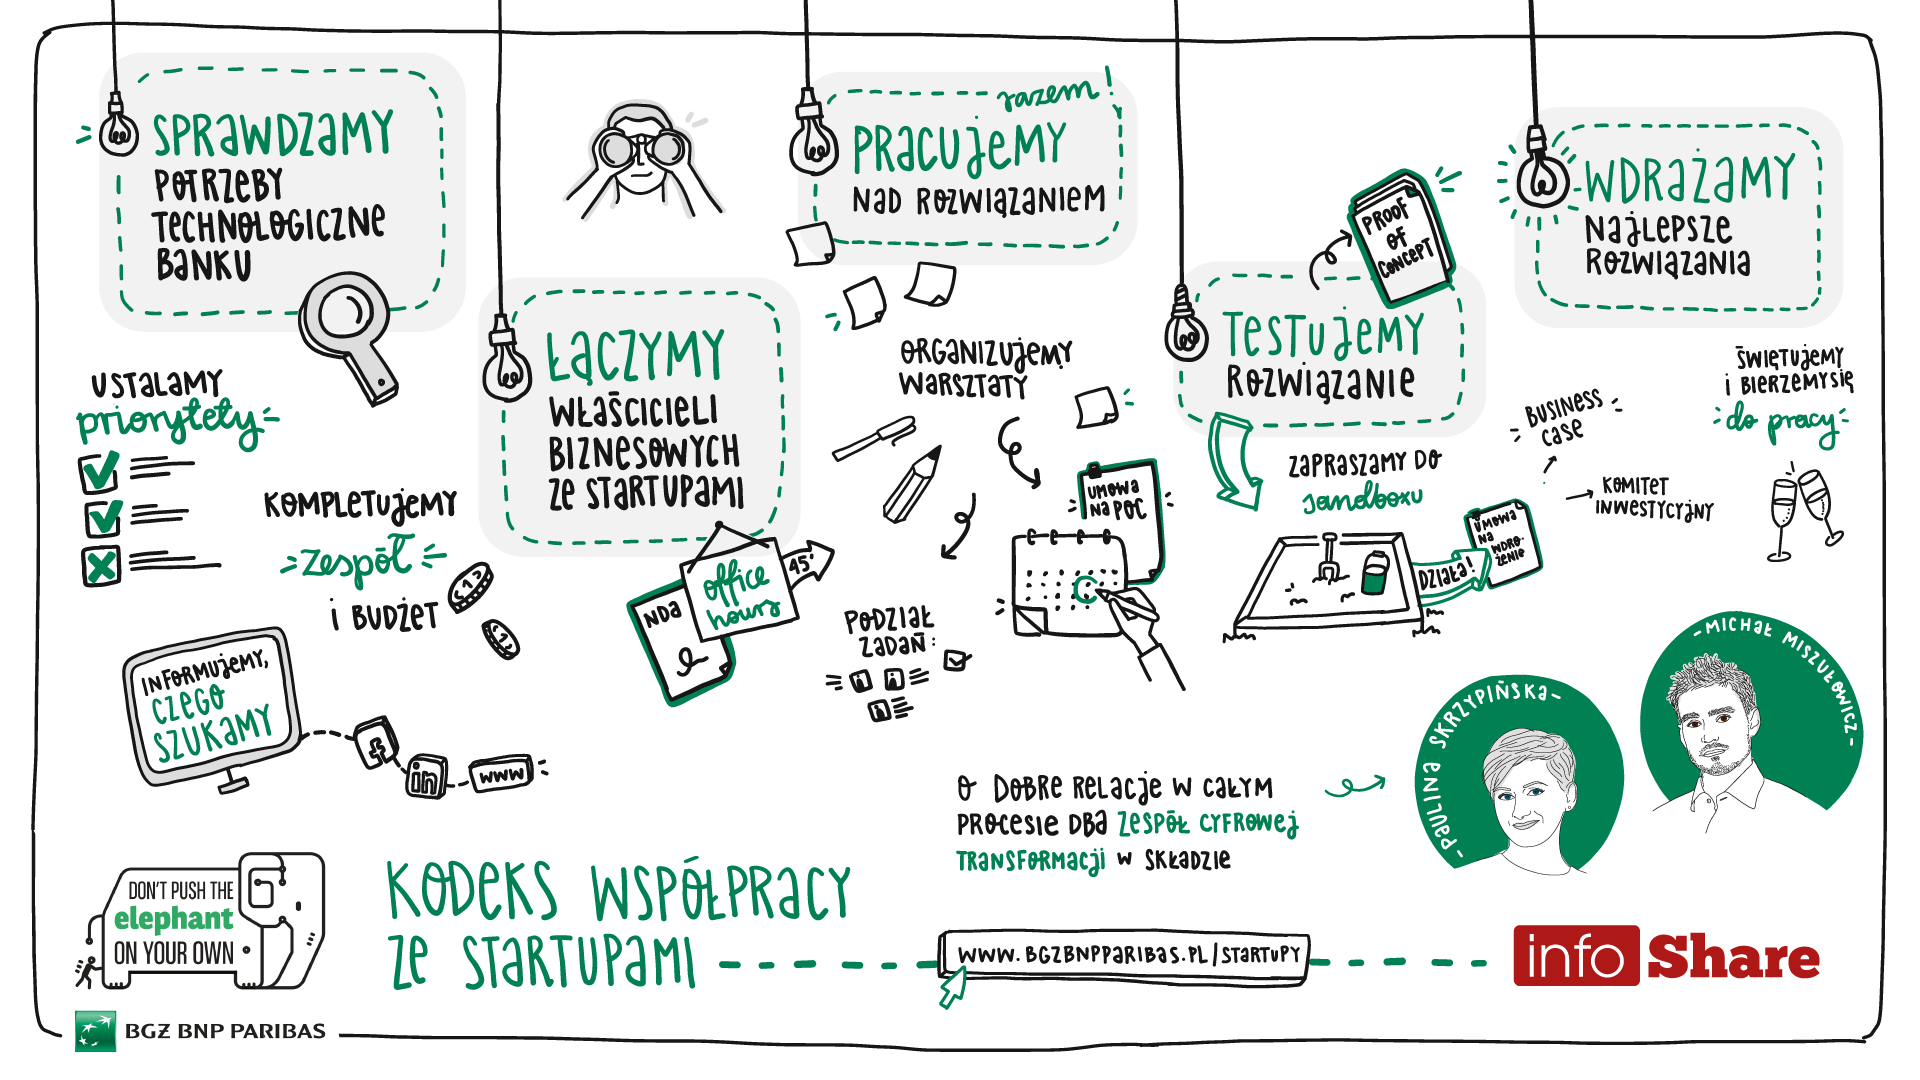 kodeks_wspolpracy_ze_startupami_bgz_bnp_paribas